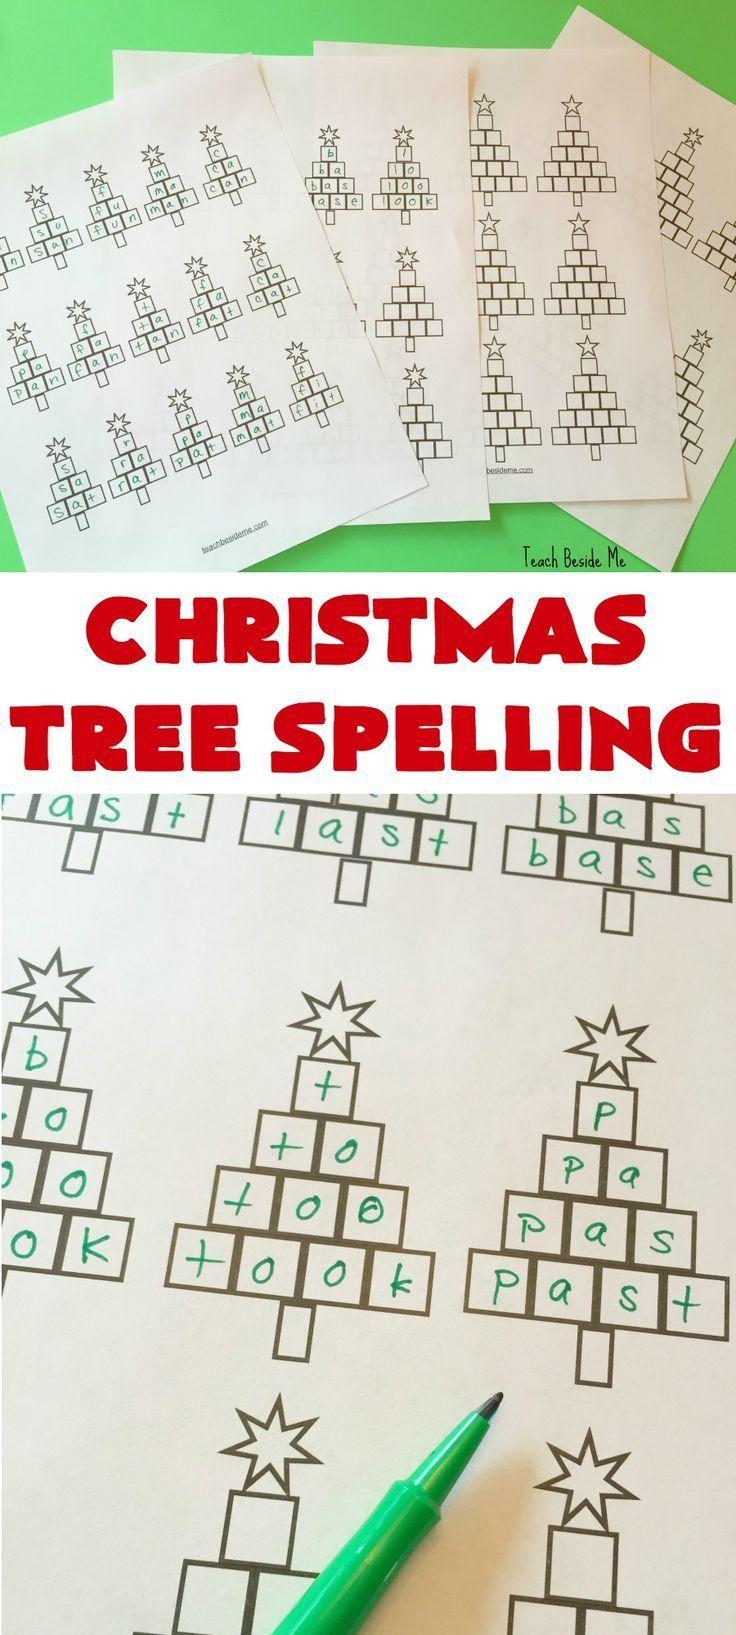 Christmas Tree Spelling Worksheets Spelling Worksheets Christmas Teaching Teaching Spelling [ 1635 x 736 Pixel ]